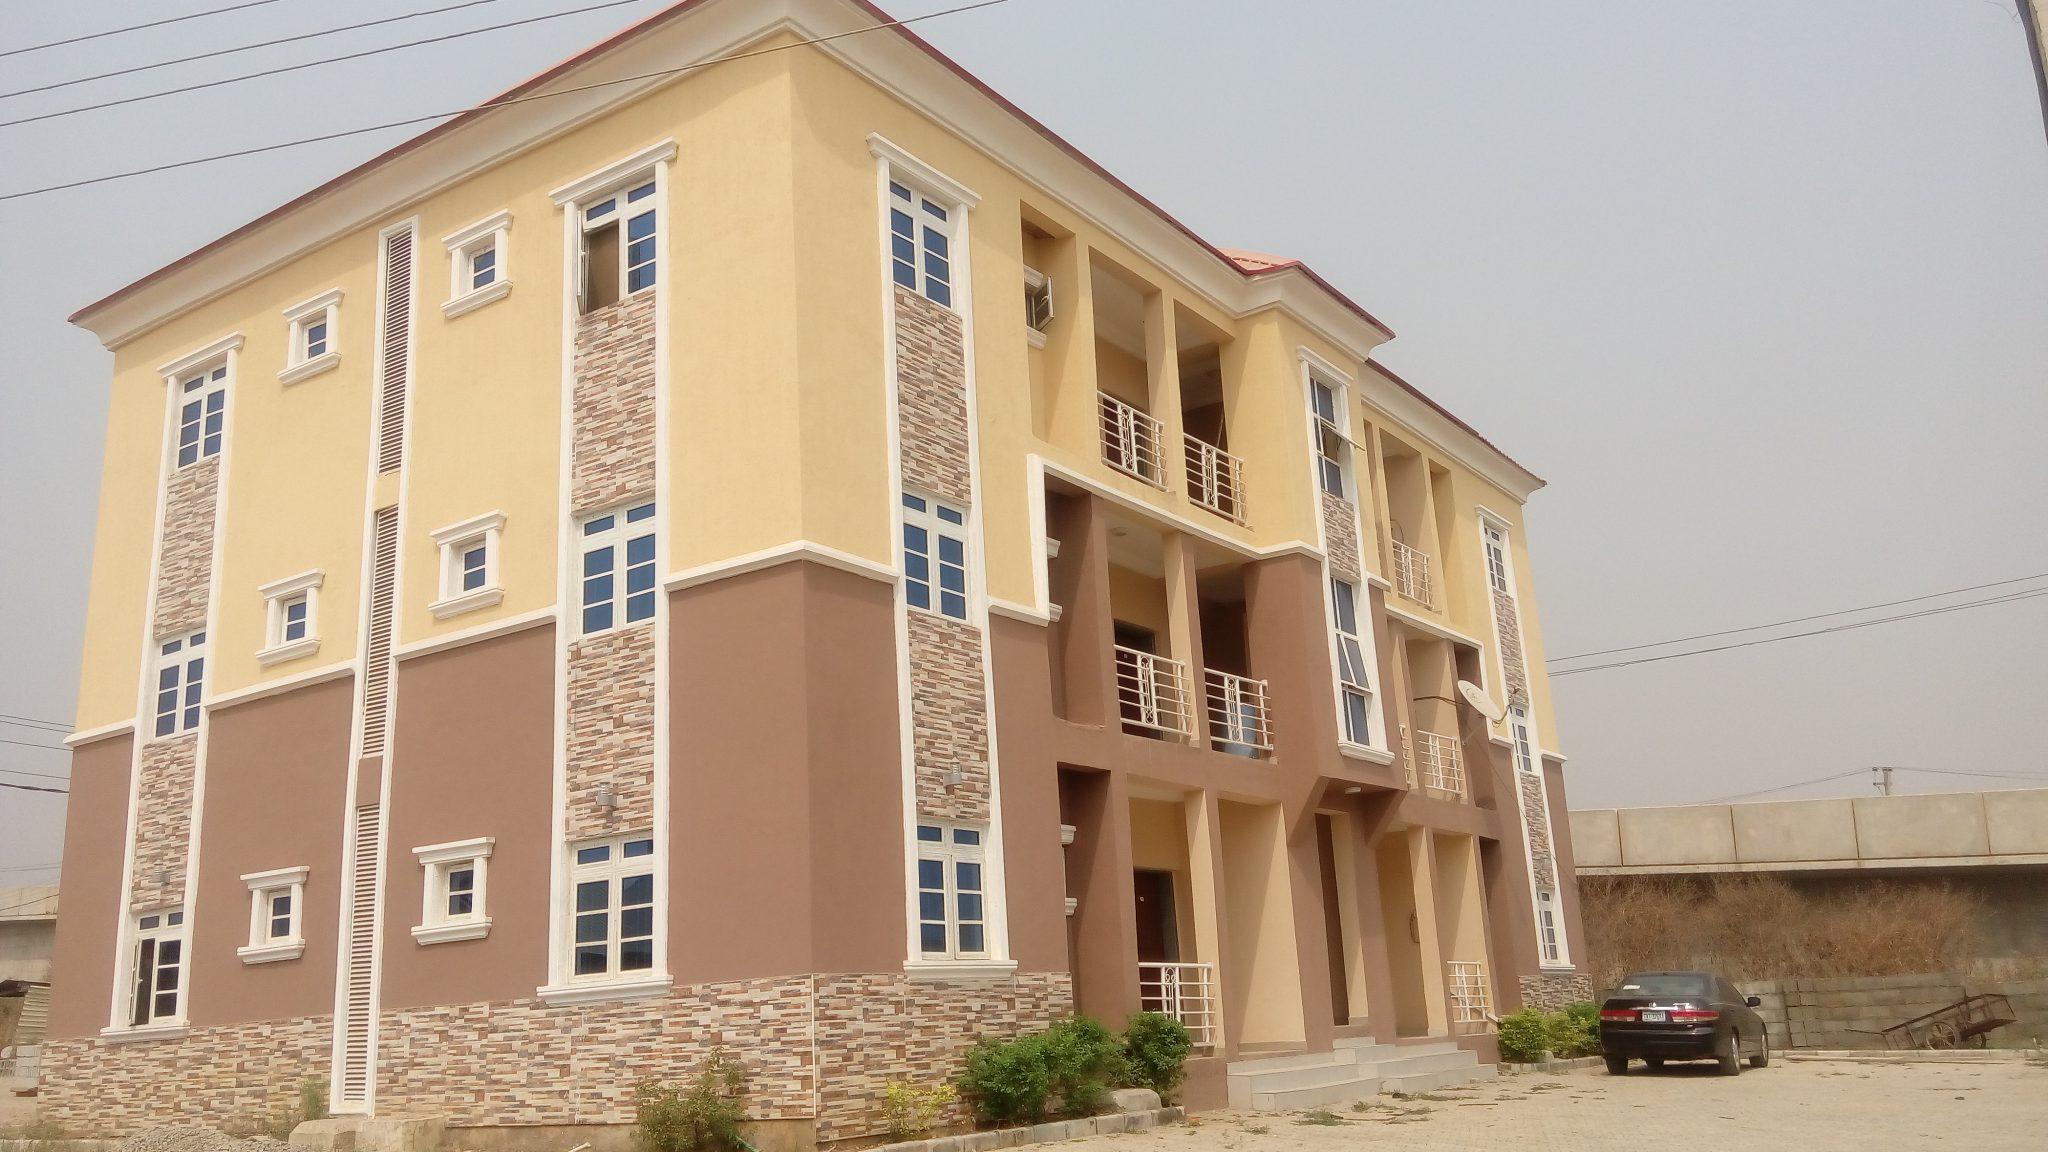 dantata housing estate kubuwa phase 1 - dantata town developers